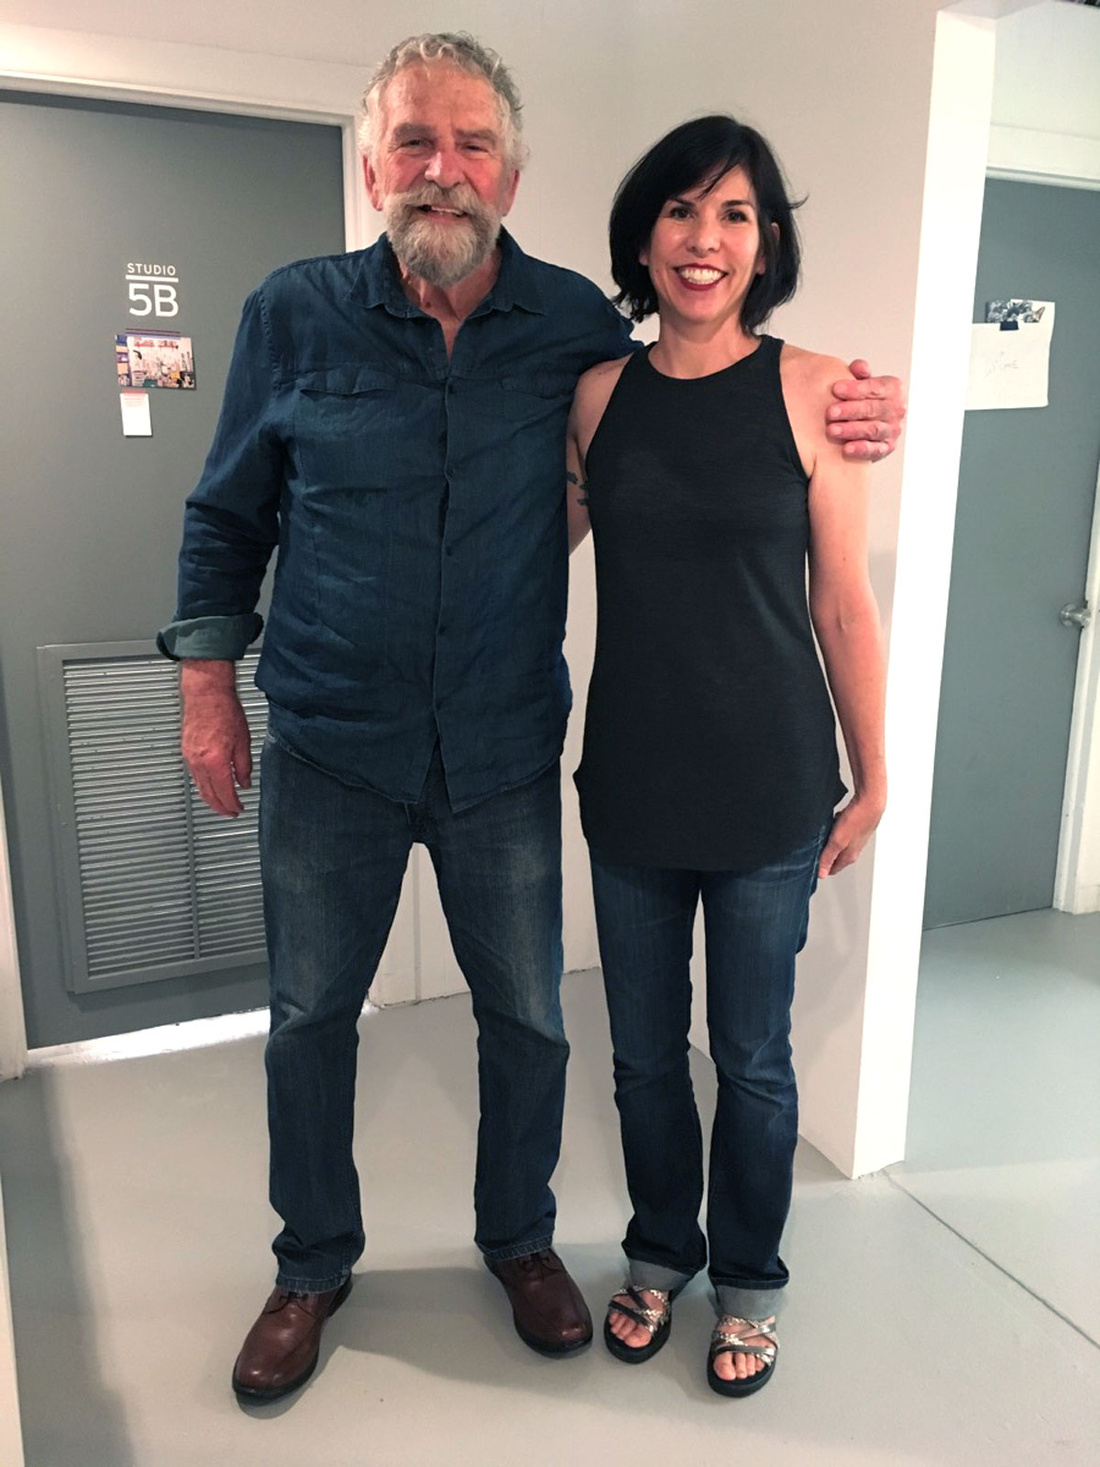 Robert and Kristen Thiele, courtesy of Bridge Red Studios.